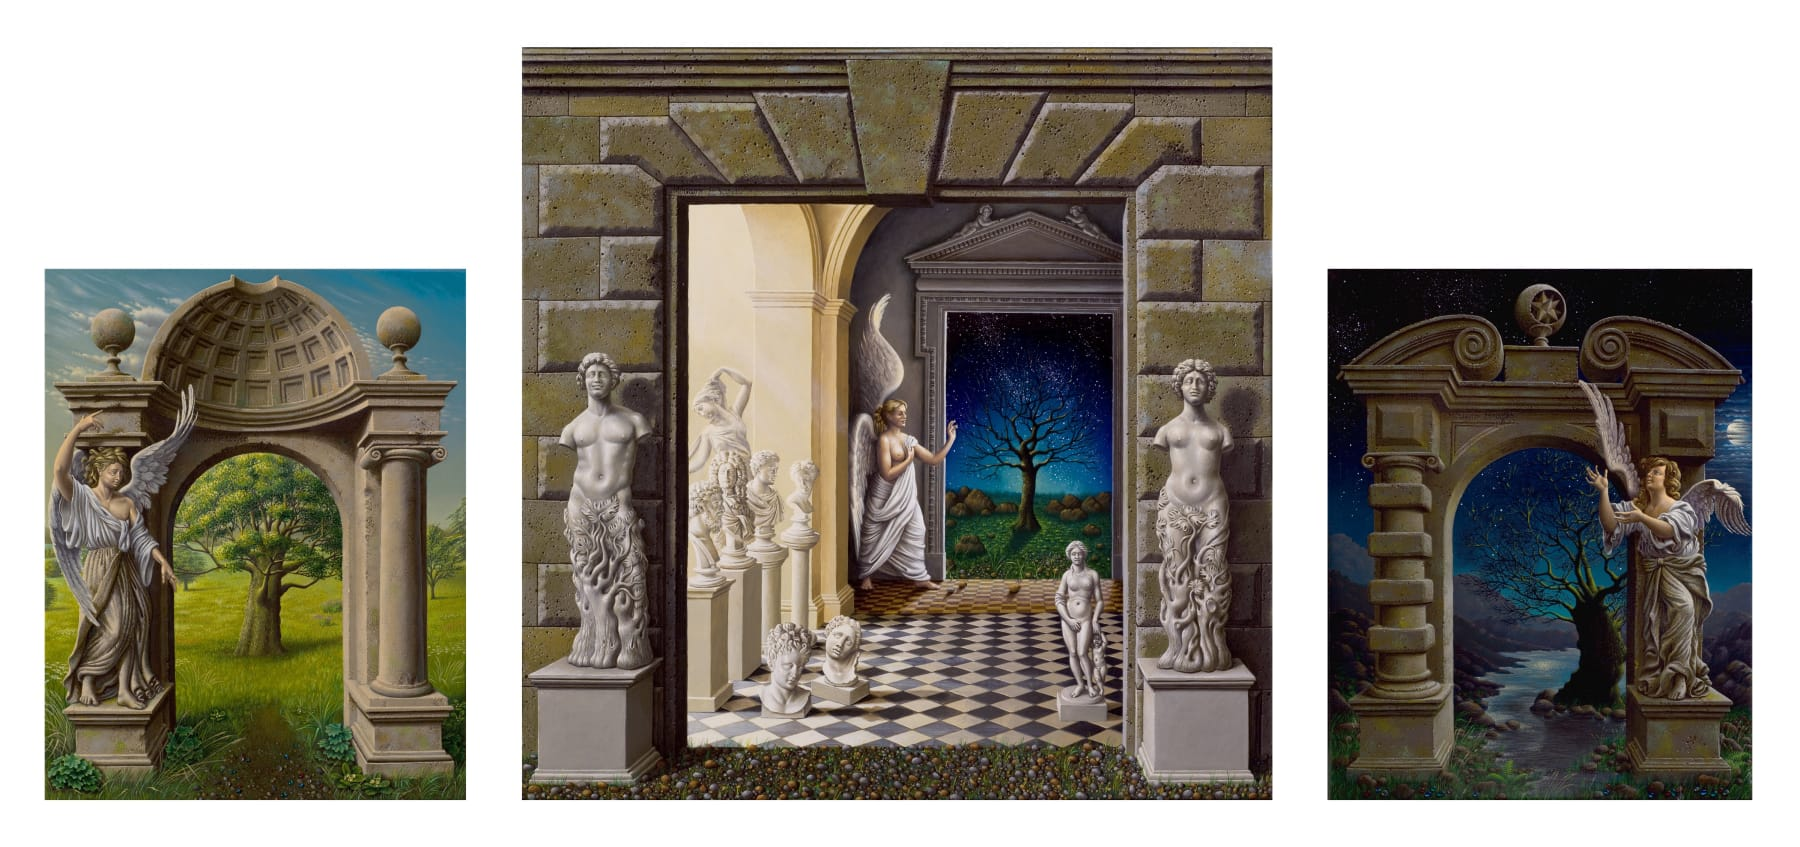 Miriam Escofet, The Portals (Triptych), 2007